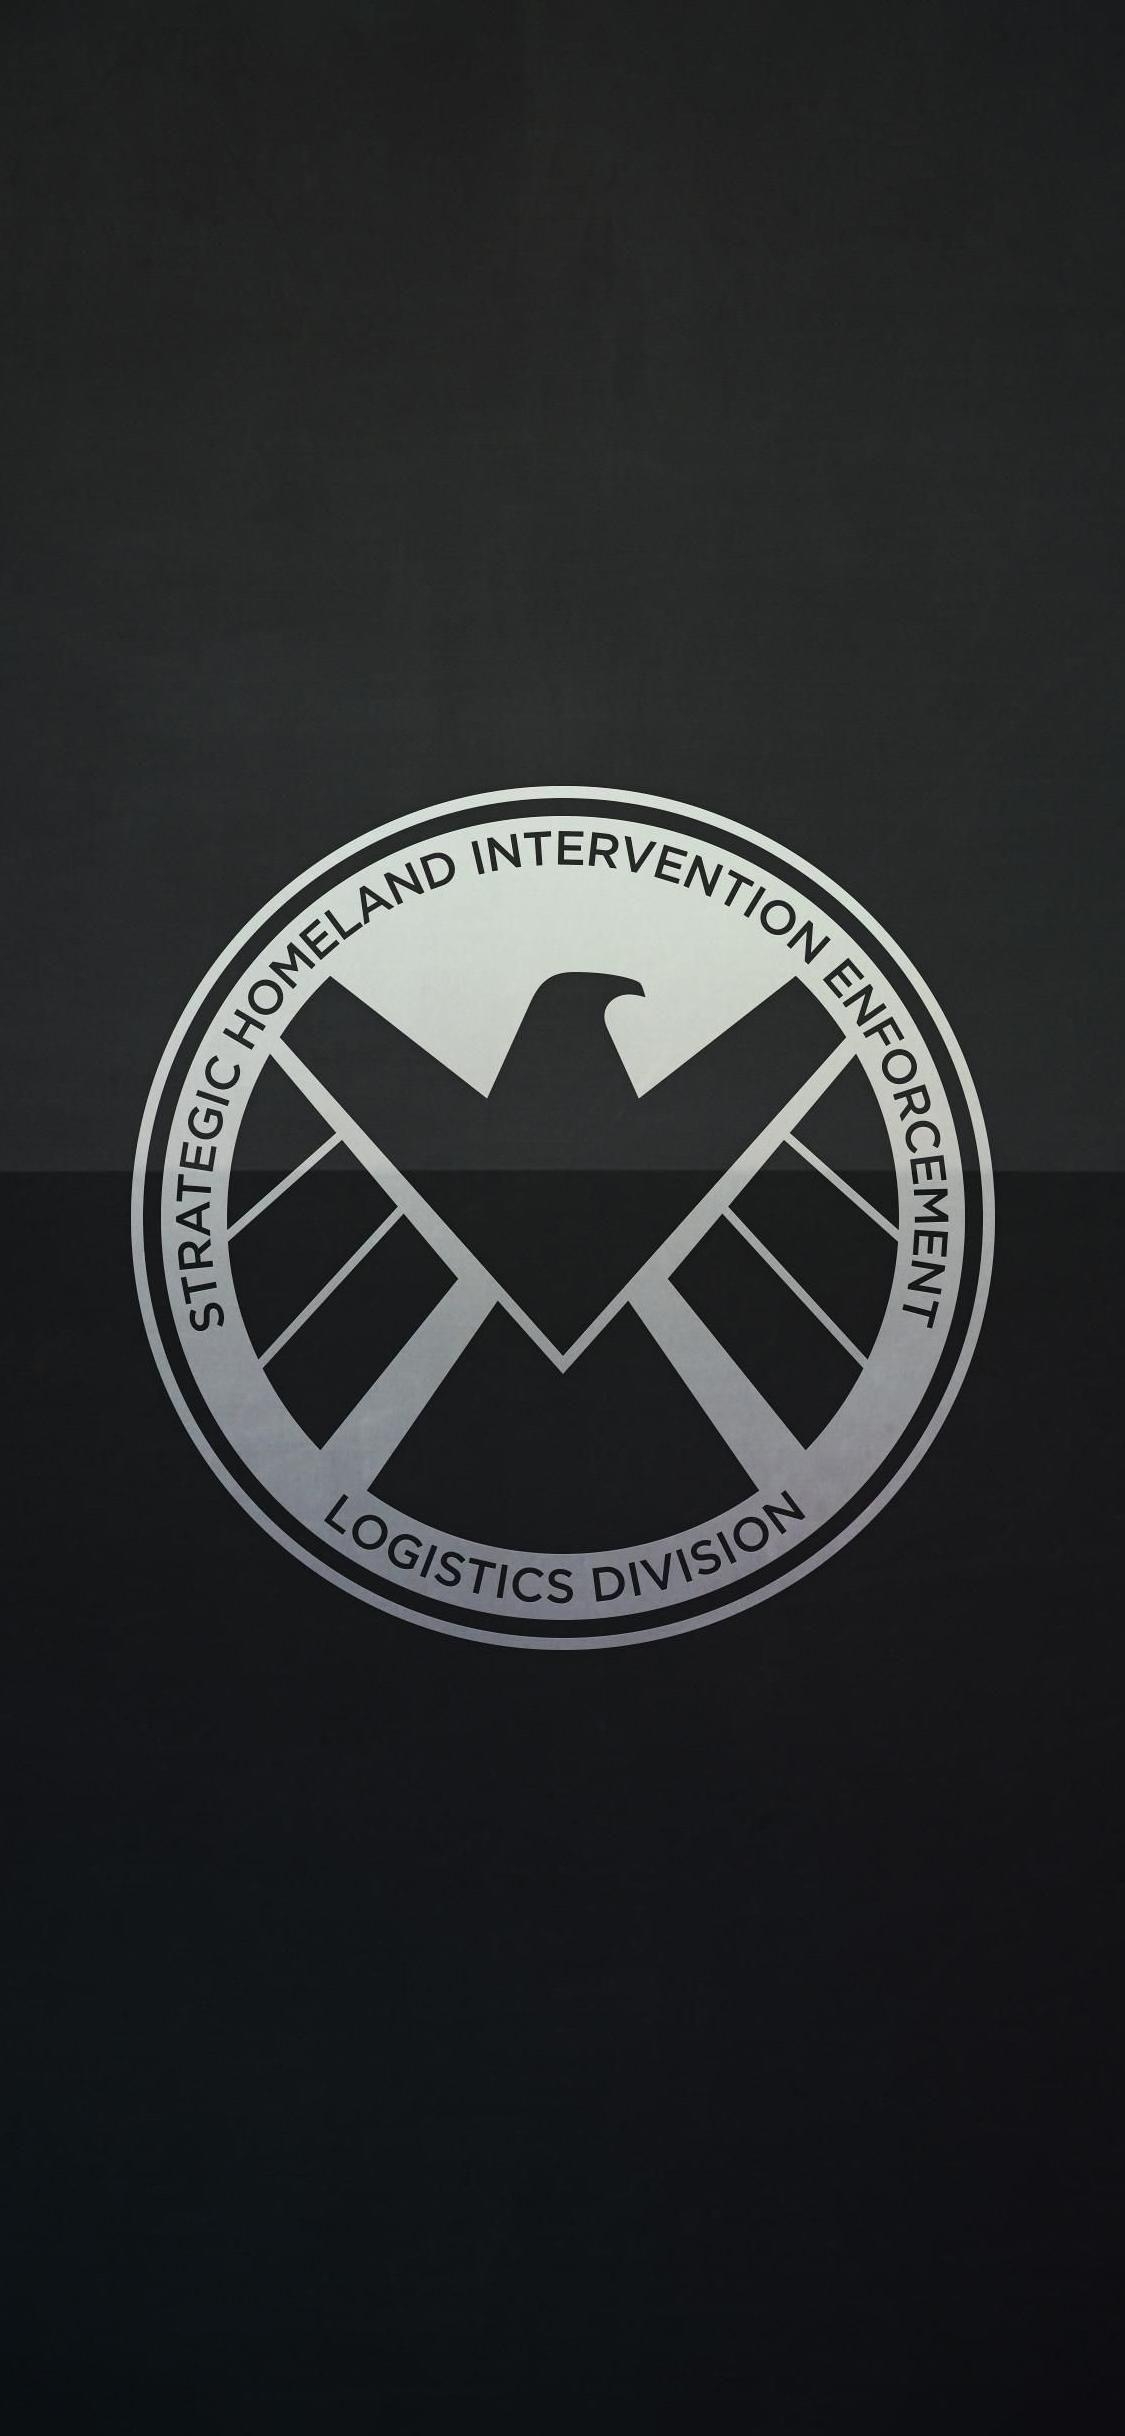 Get Top Hero Logo Wallpapers For Iphone Xs 2019 Uploade By Reddit Com Free Smartphone Wallpaper